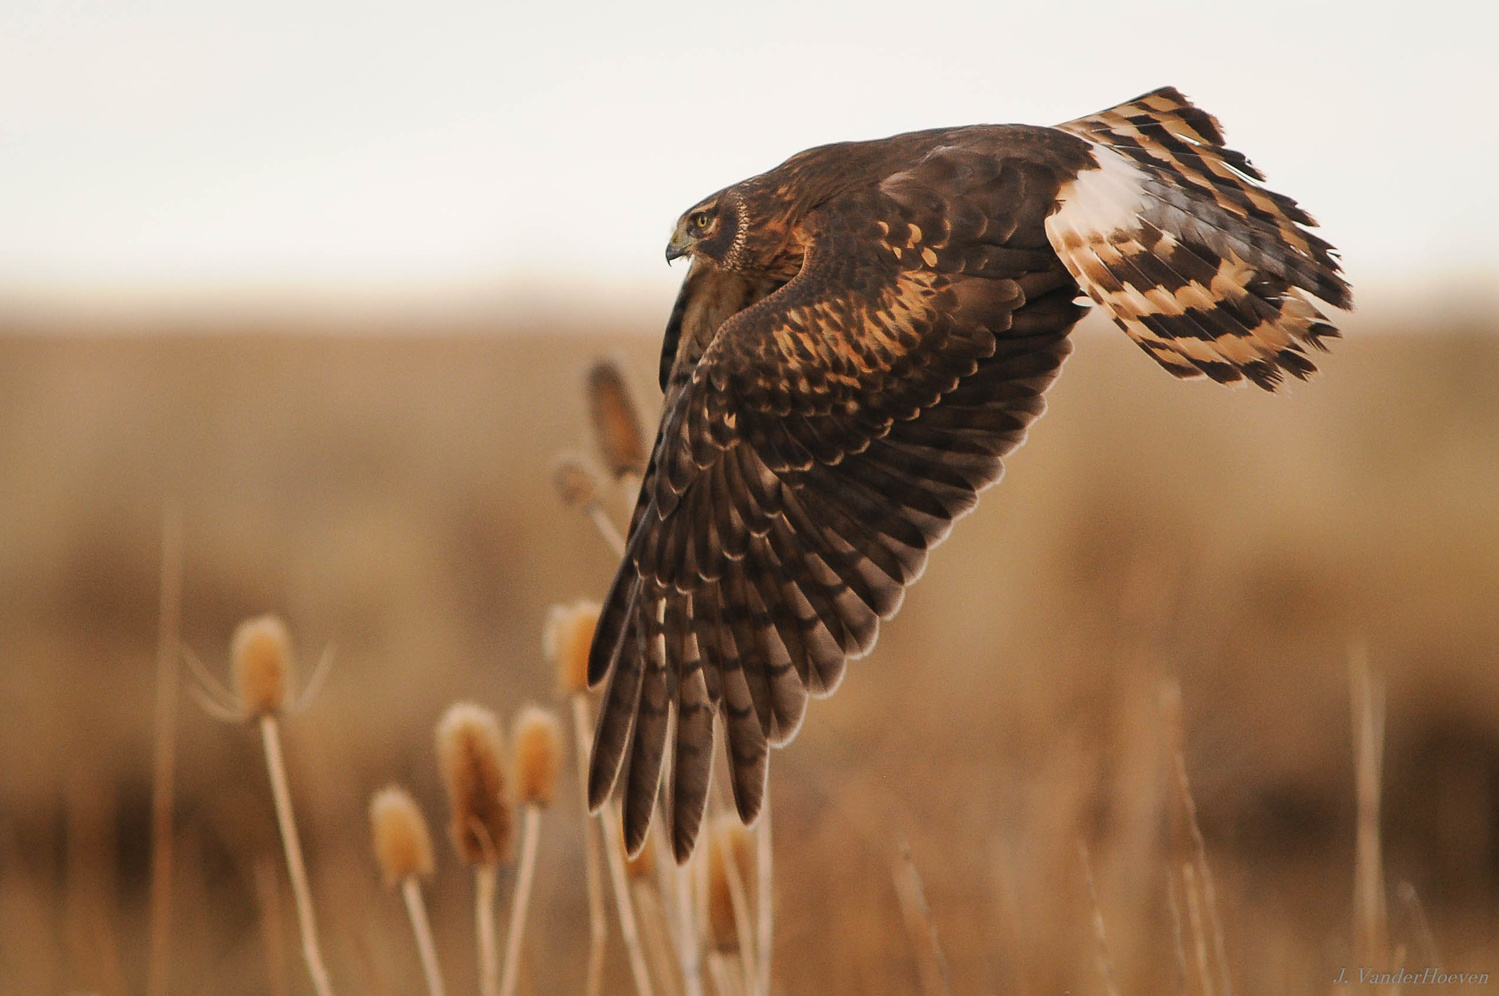 Northern Harrier by Jake VanderHoeven